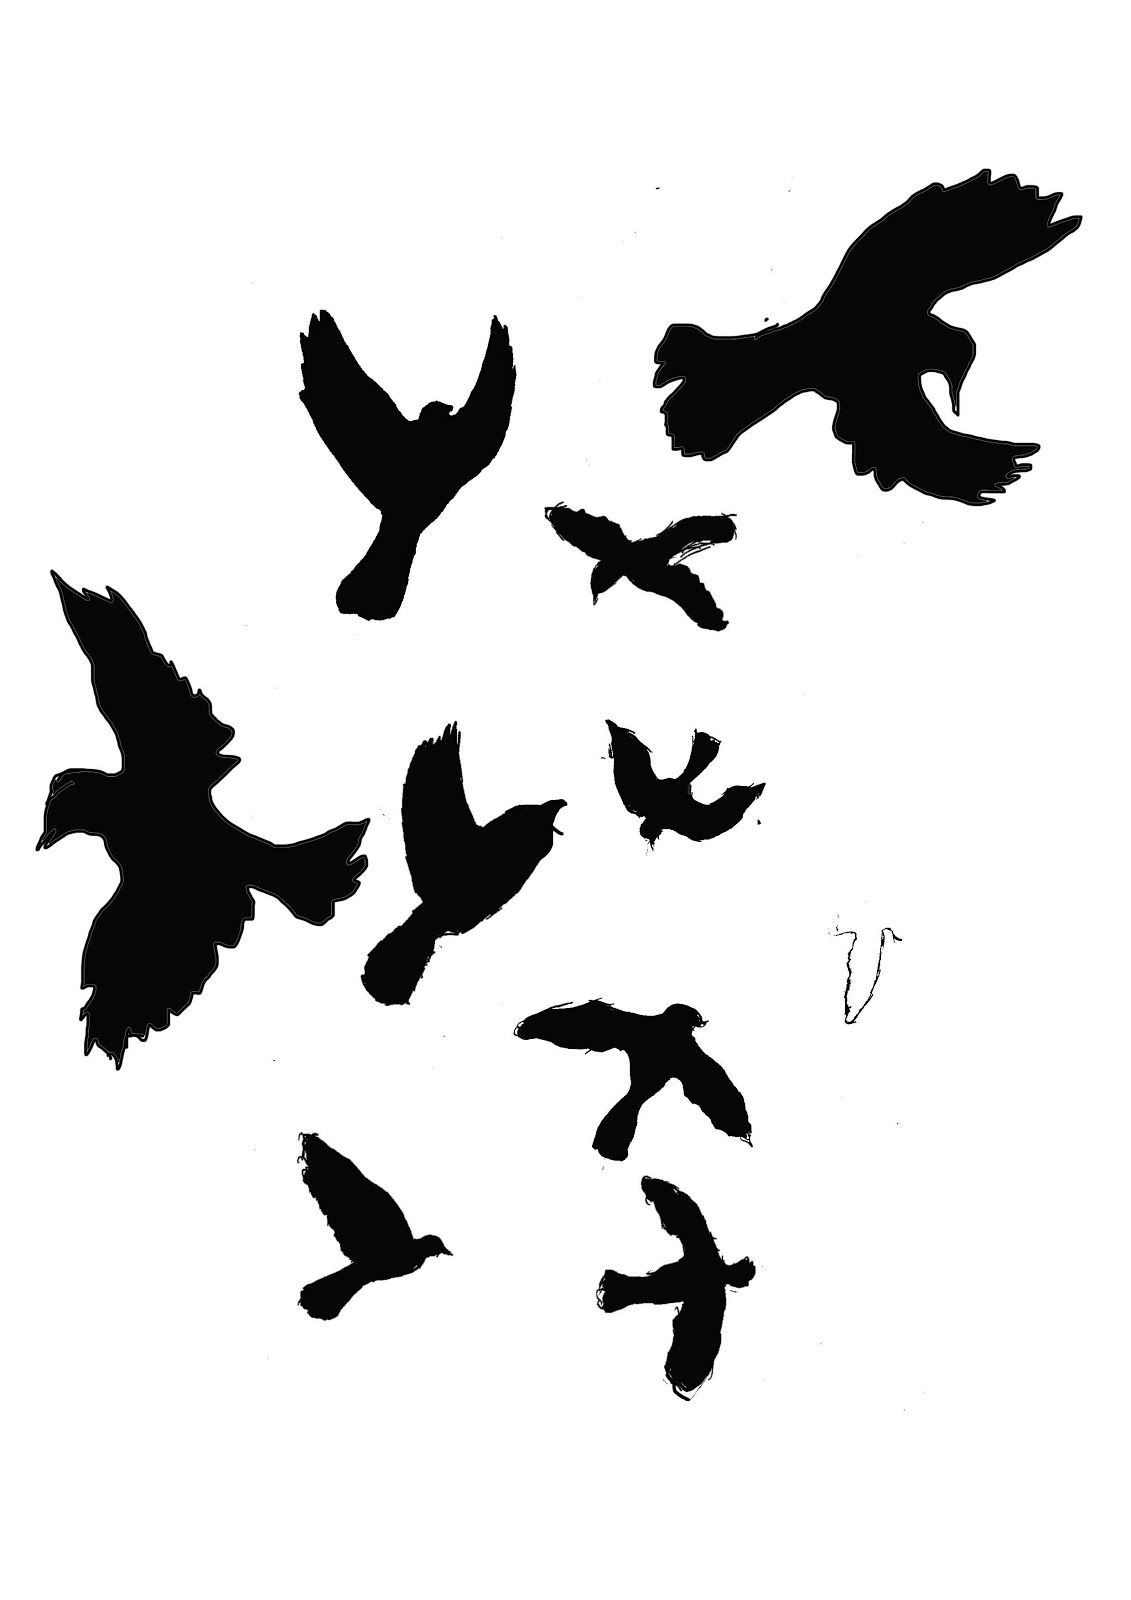 Tomcharlesworth Mocking Bird Silhouettes For Sleeve